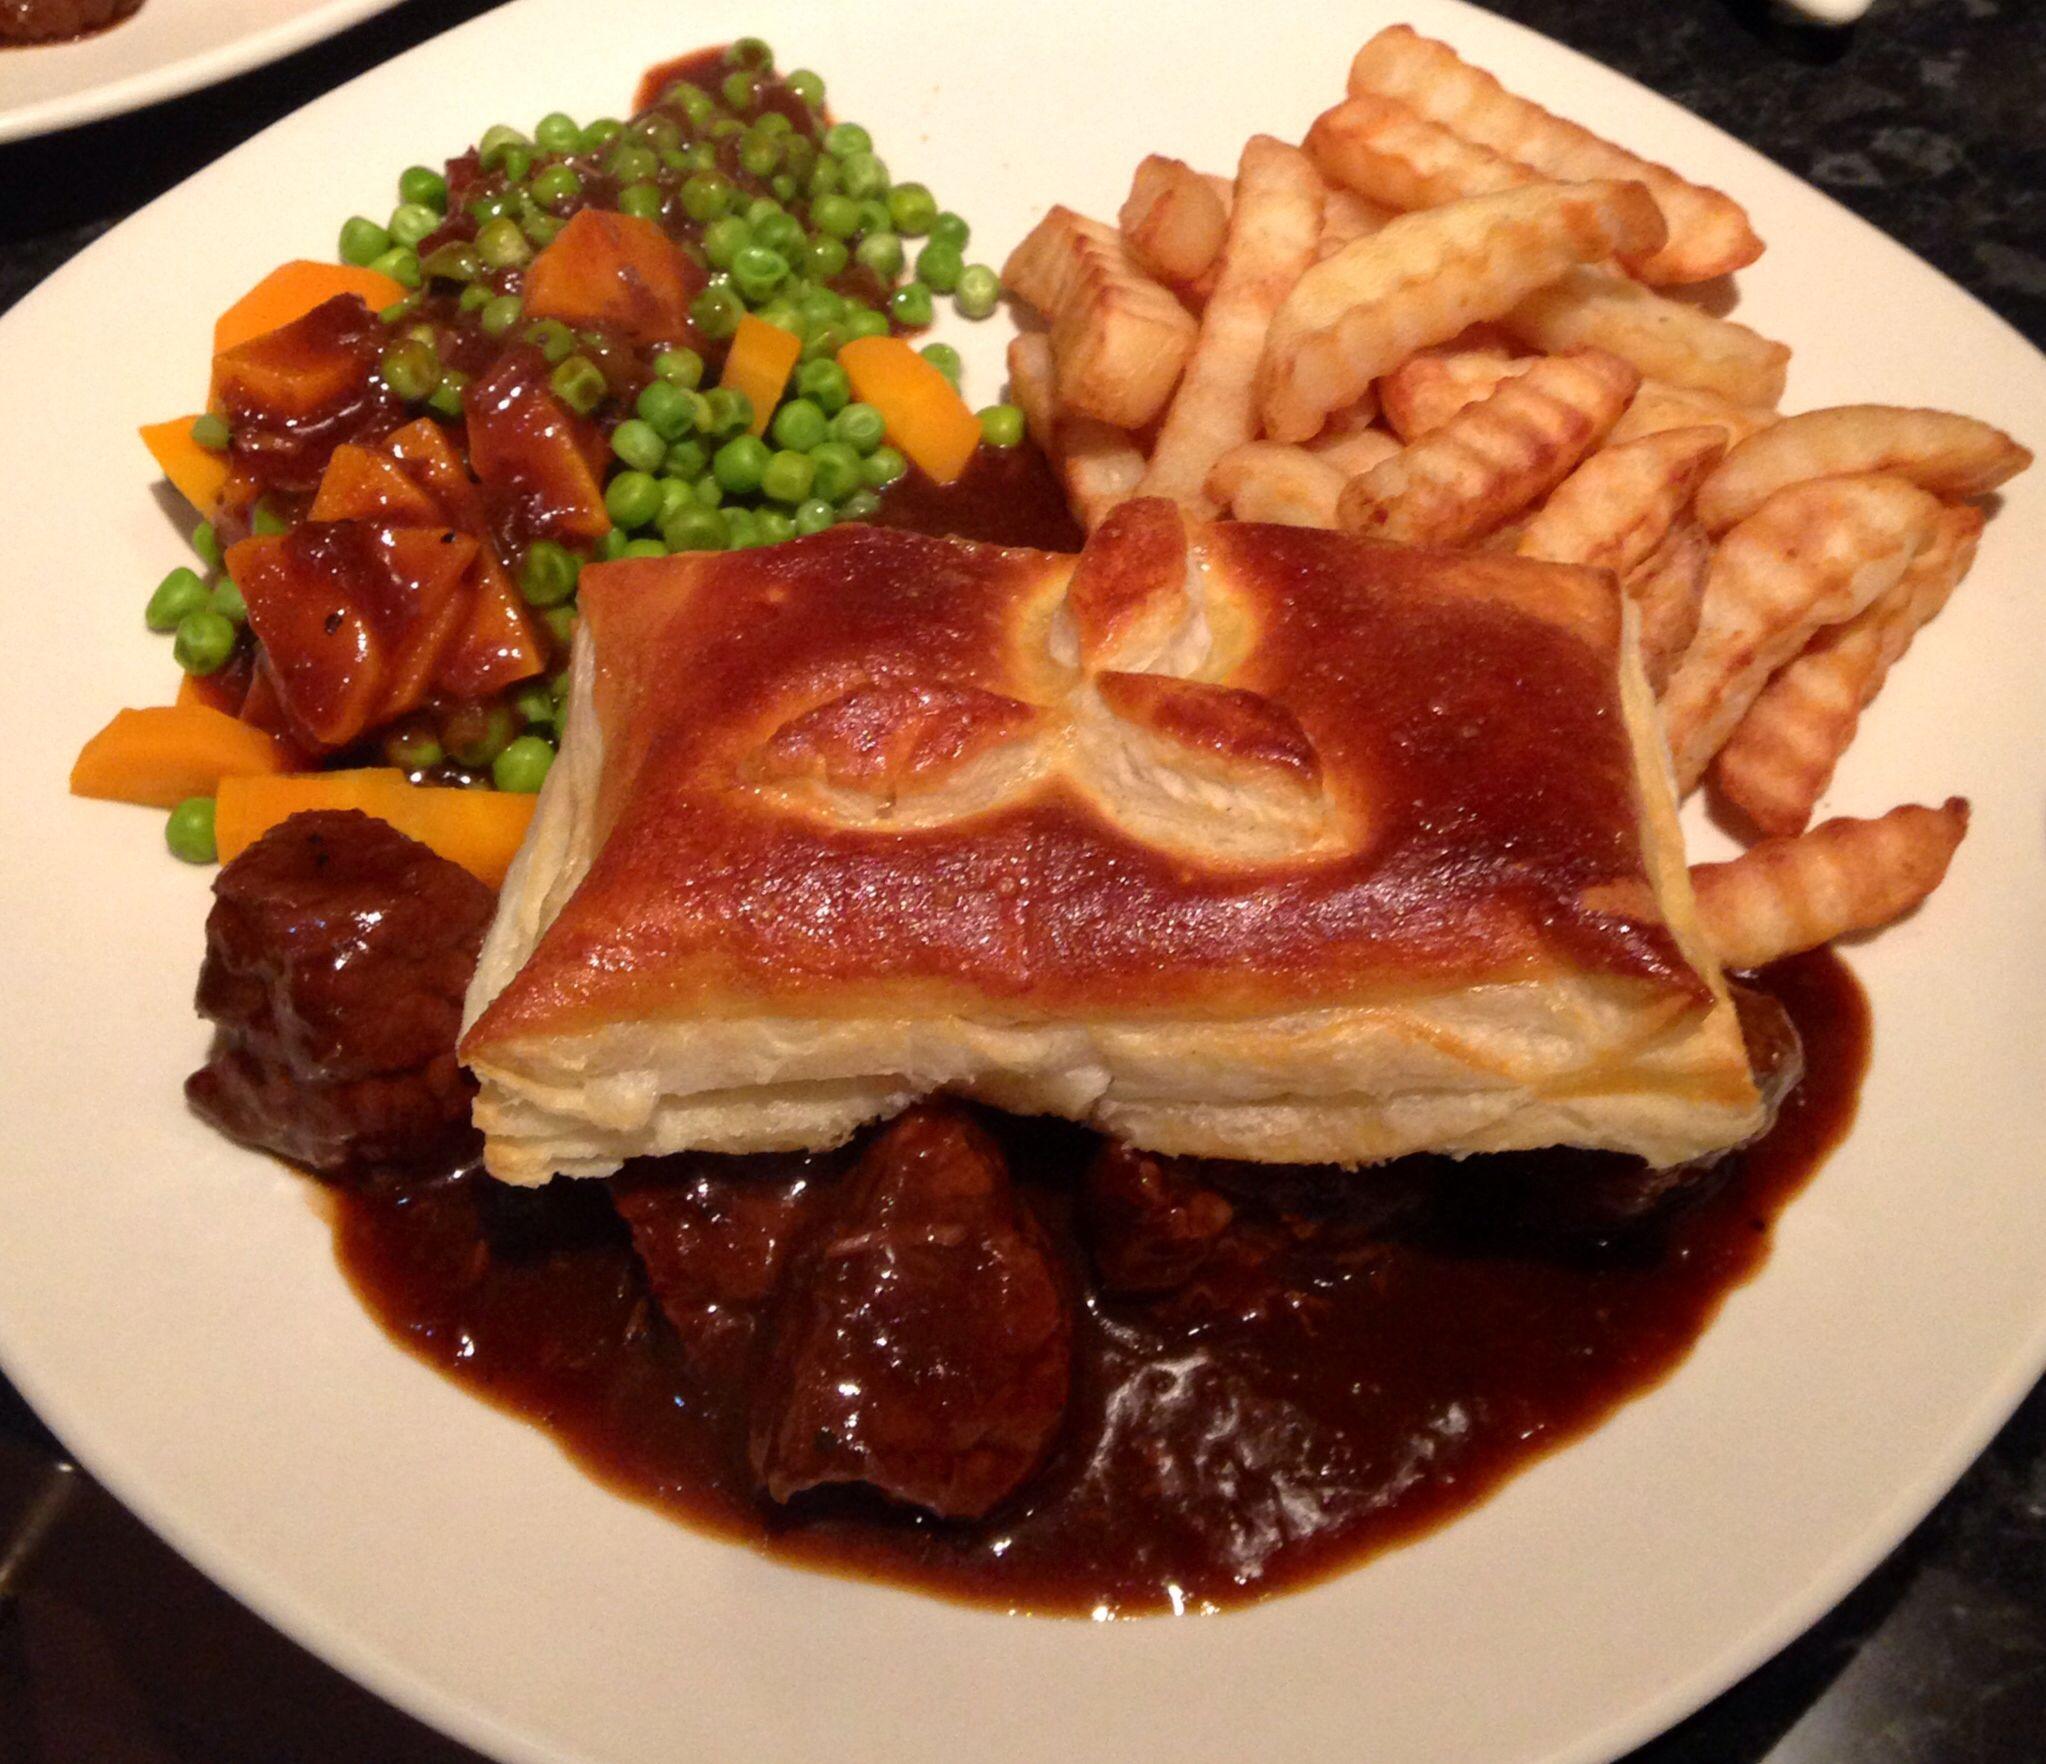 Homemade steak pie | Food, Steak pie, Breakfast